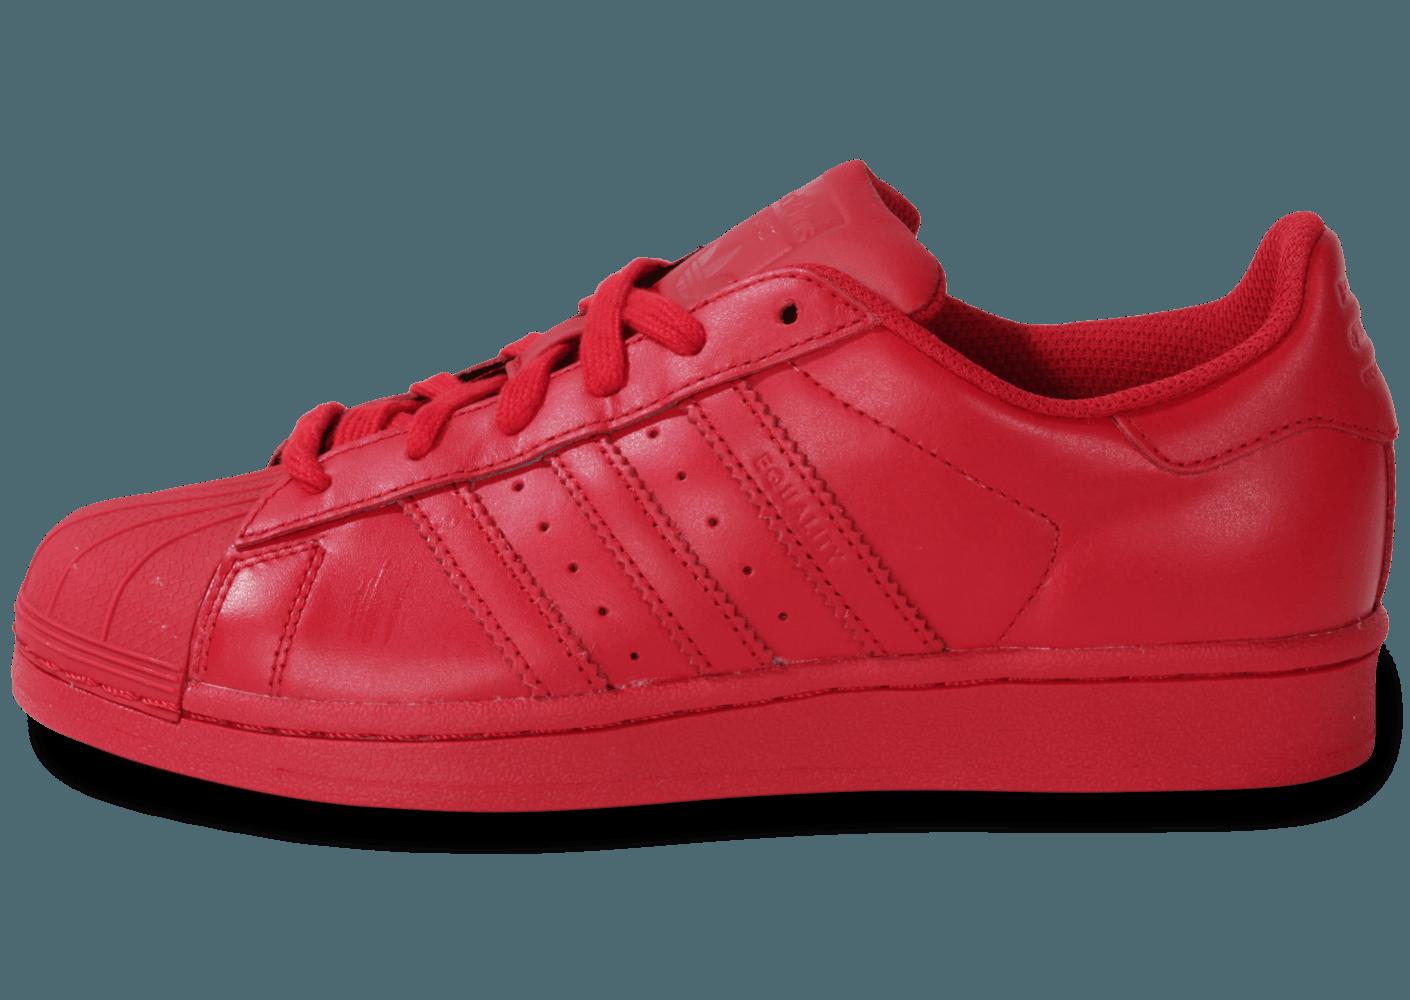 ebc2c9a143 adidas supercolor rouge